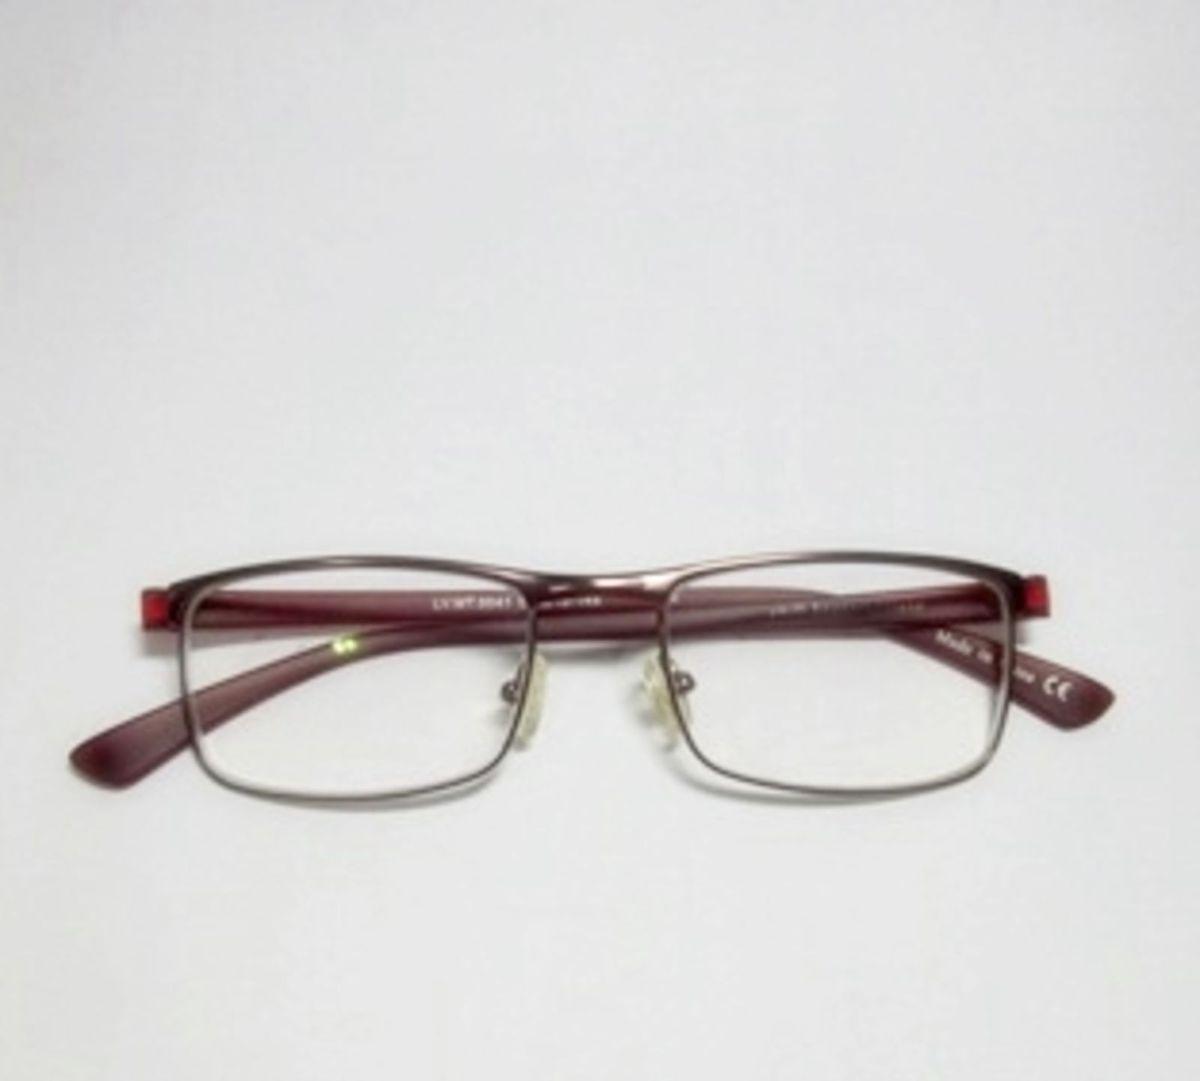 ab0519a8fbed8 nerd - óculos chillibeans.  Czm6ly9wag90b3muzw5qb2vplmnvbs5ici9wcm9kdwn0cy8ymte0ntcvnjuyotiwywnhndy1nguzndm5nzllmdjmzjziytnjogquanbn  ...